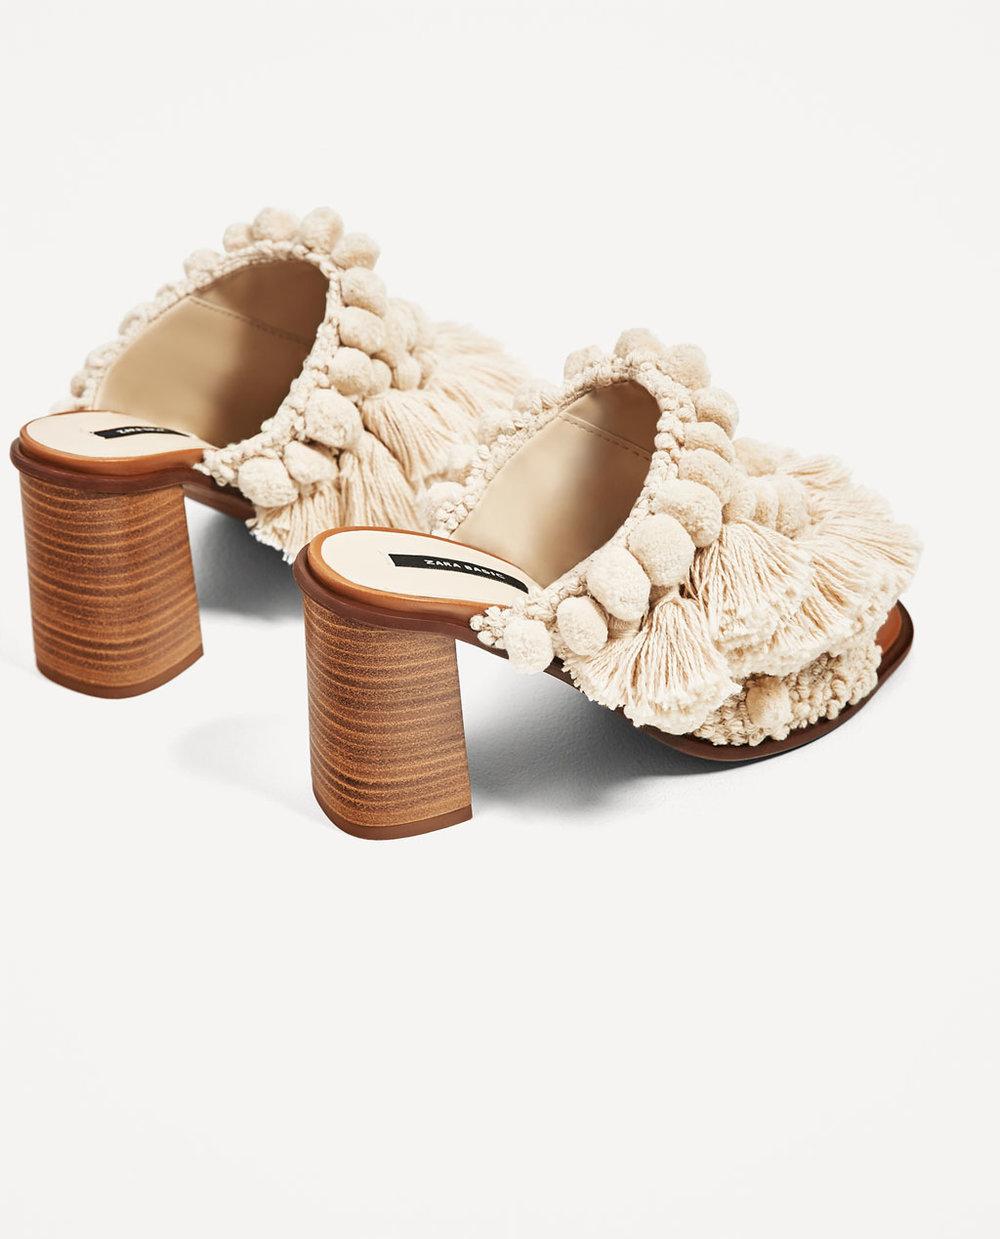 Høyhælte sko.